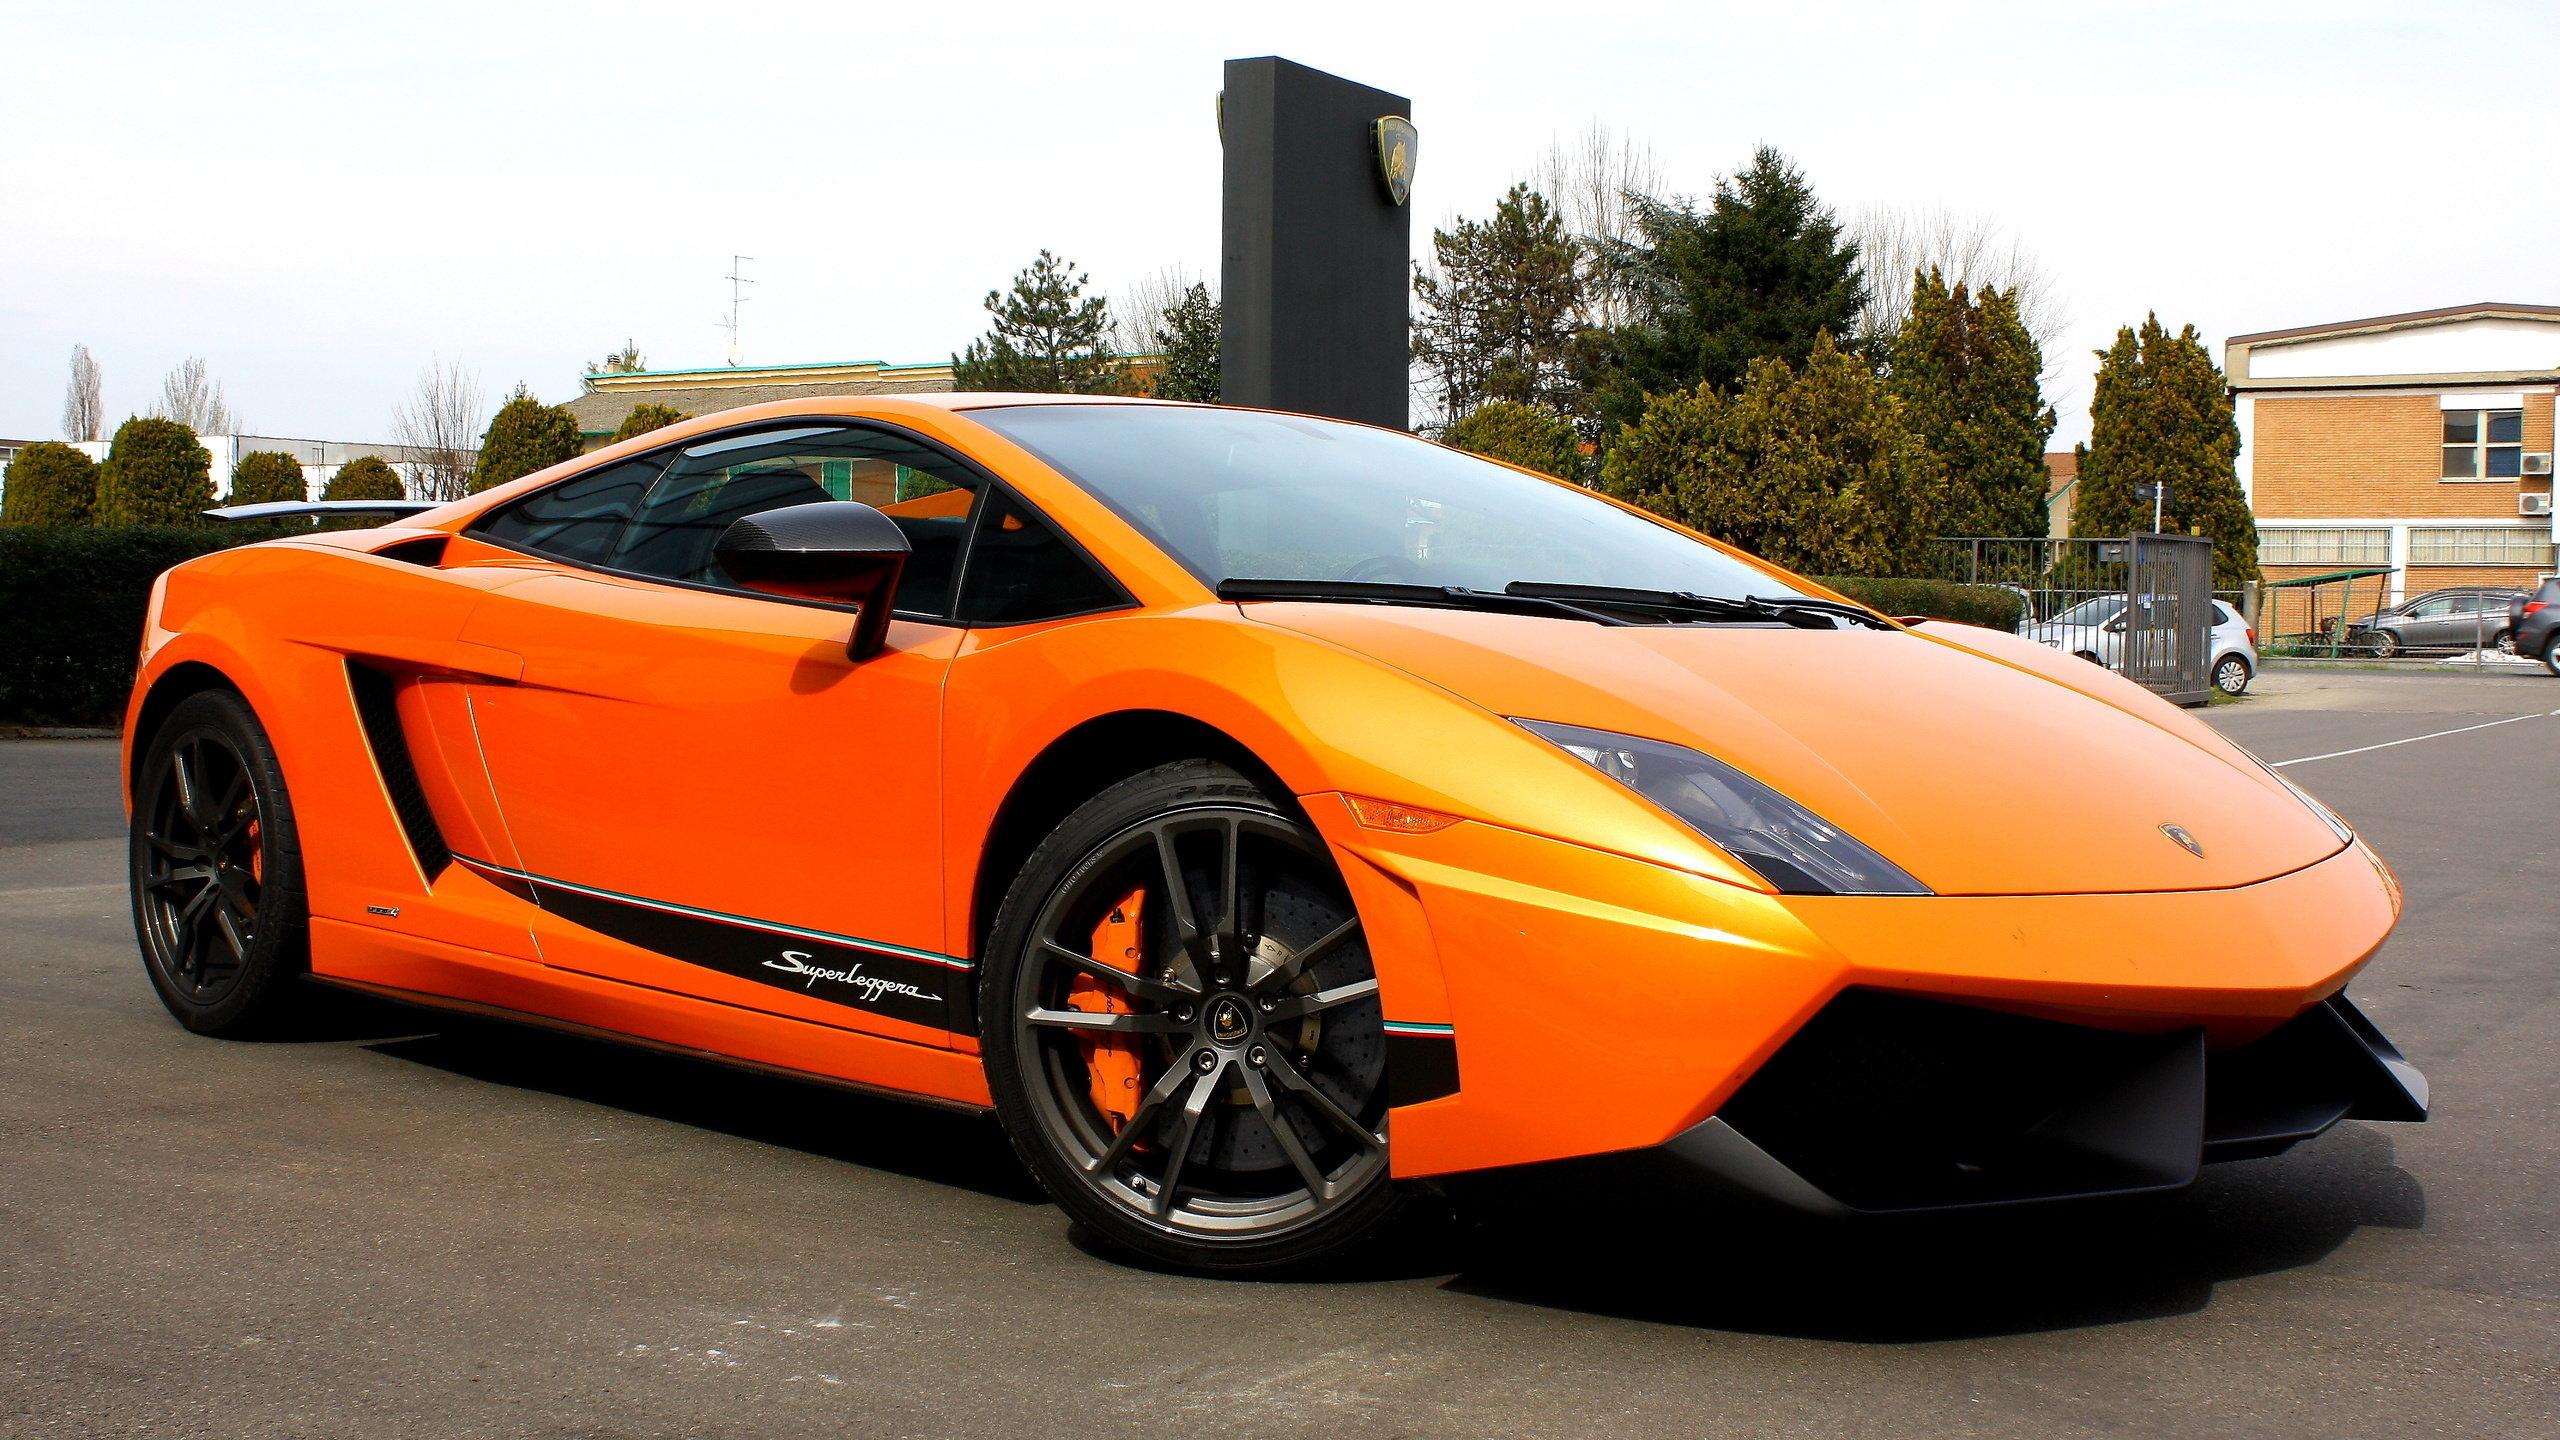 Lamborghini Wallpapers 2560x1440 Desktop Backgrounds